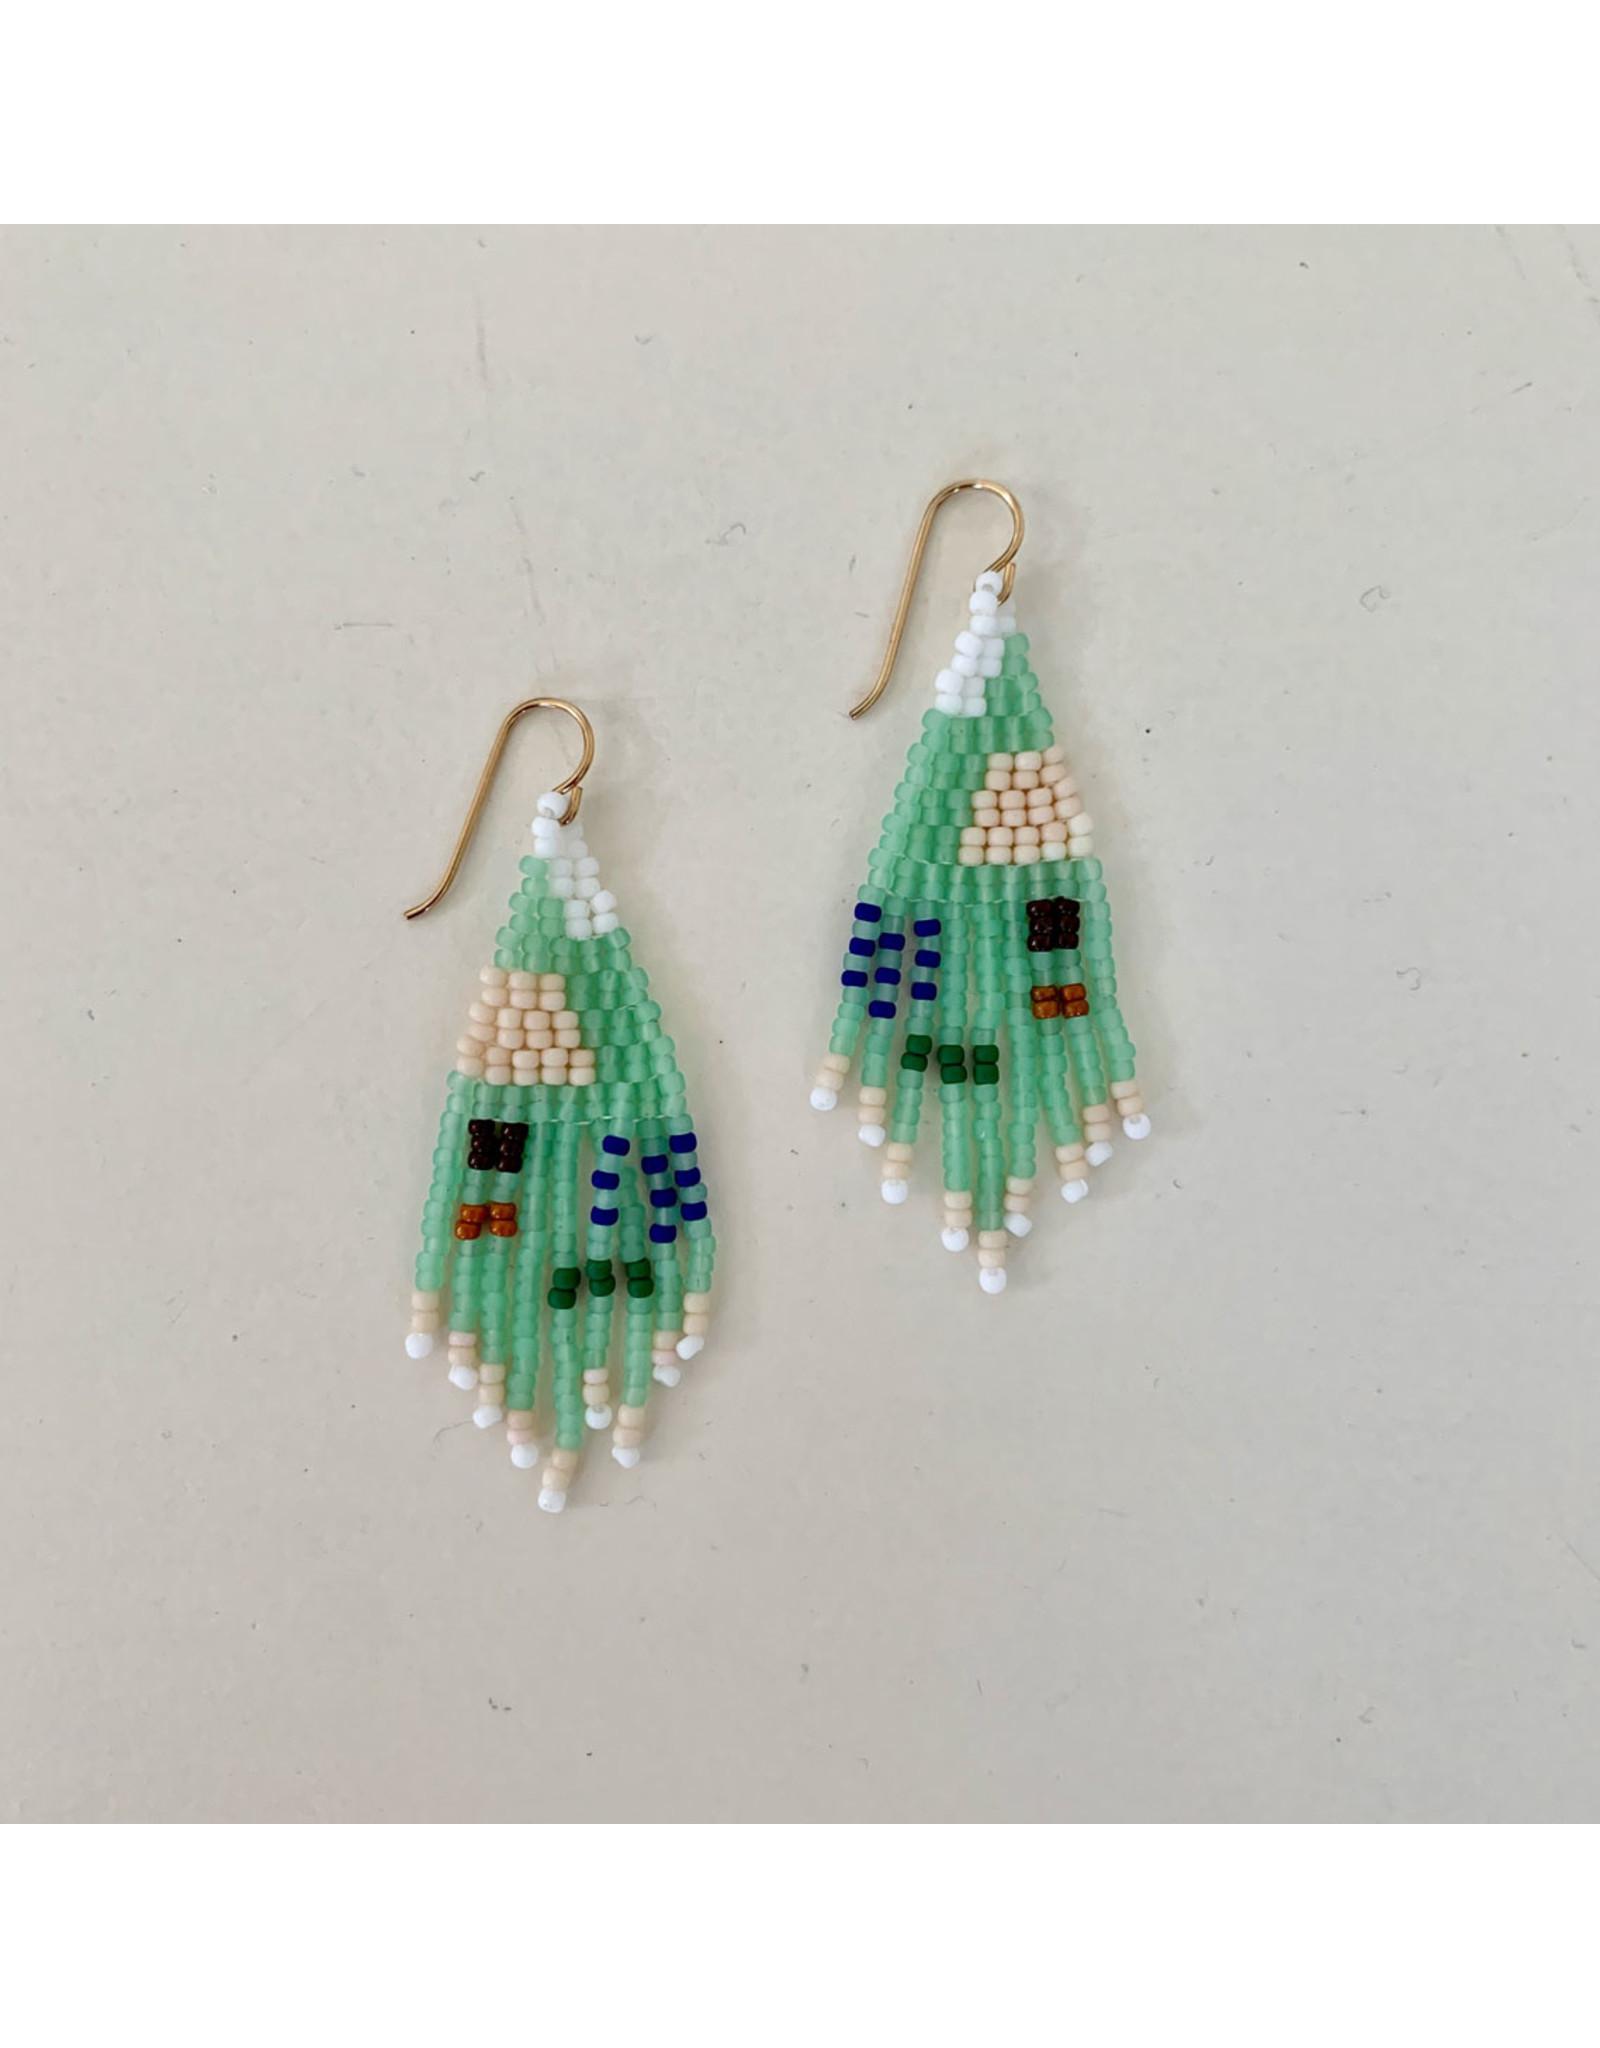 alice rise es4 baby boat to birdland turquoise earrings